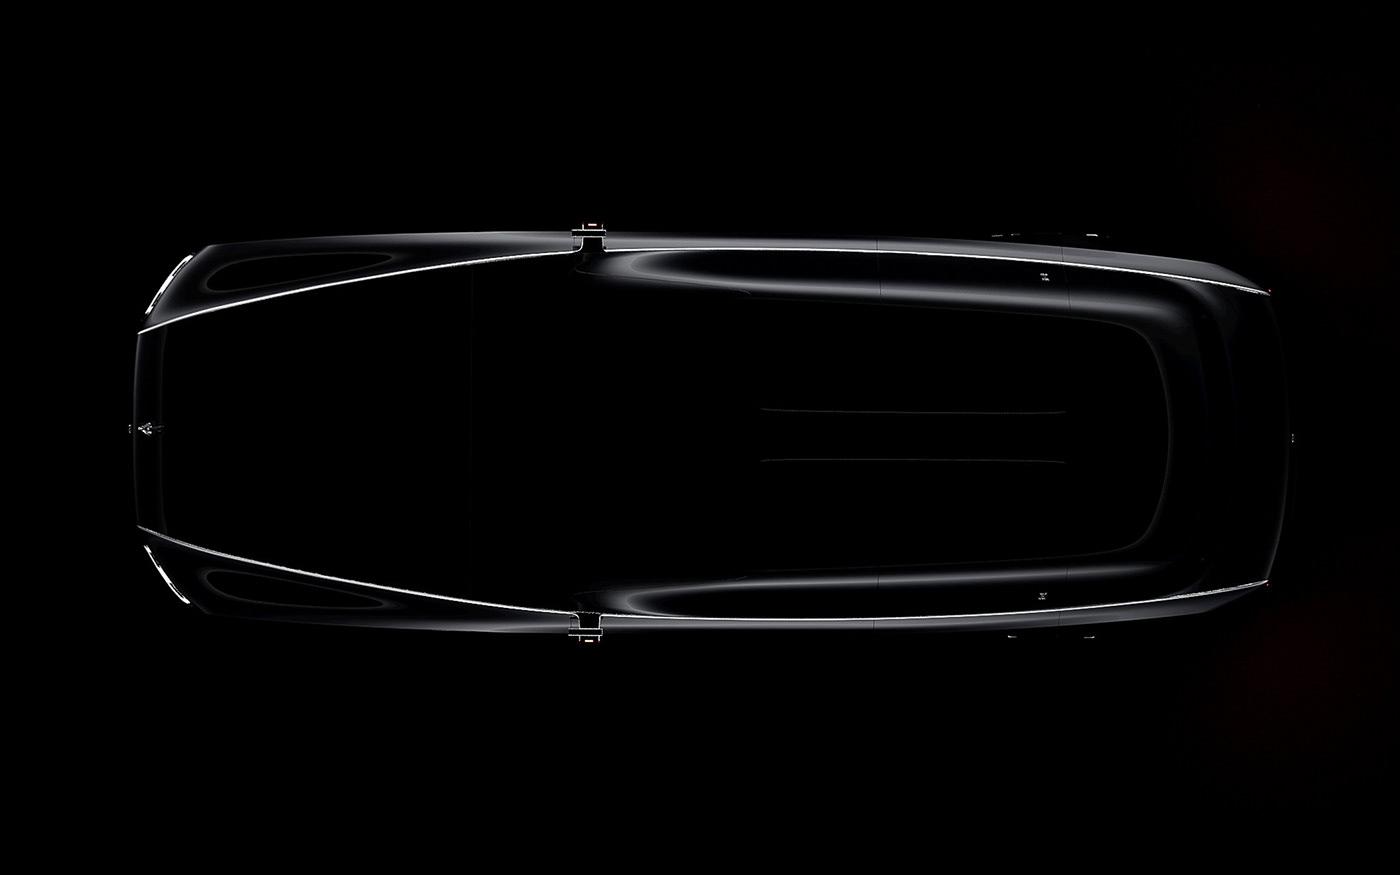 art car design digital emotion luxury Render rolls royce sketch transportation